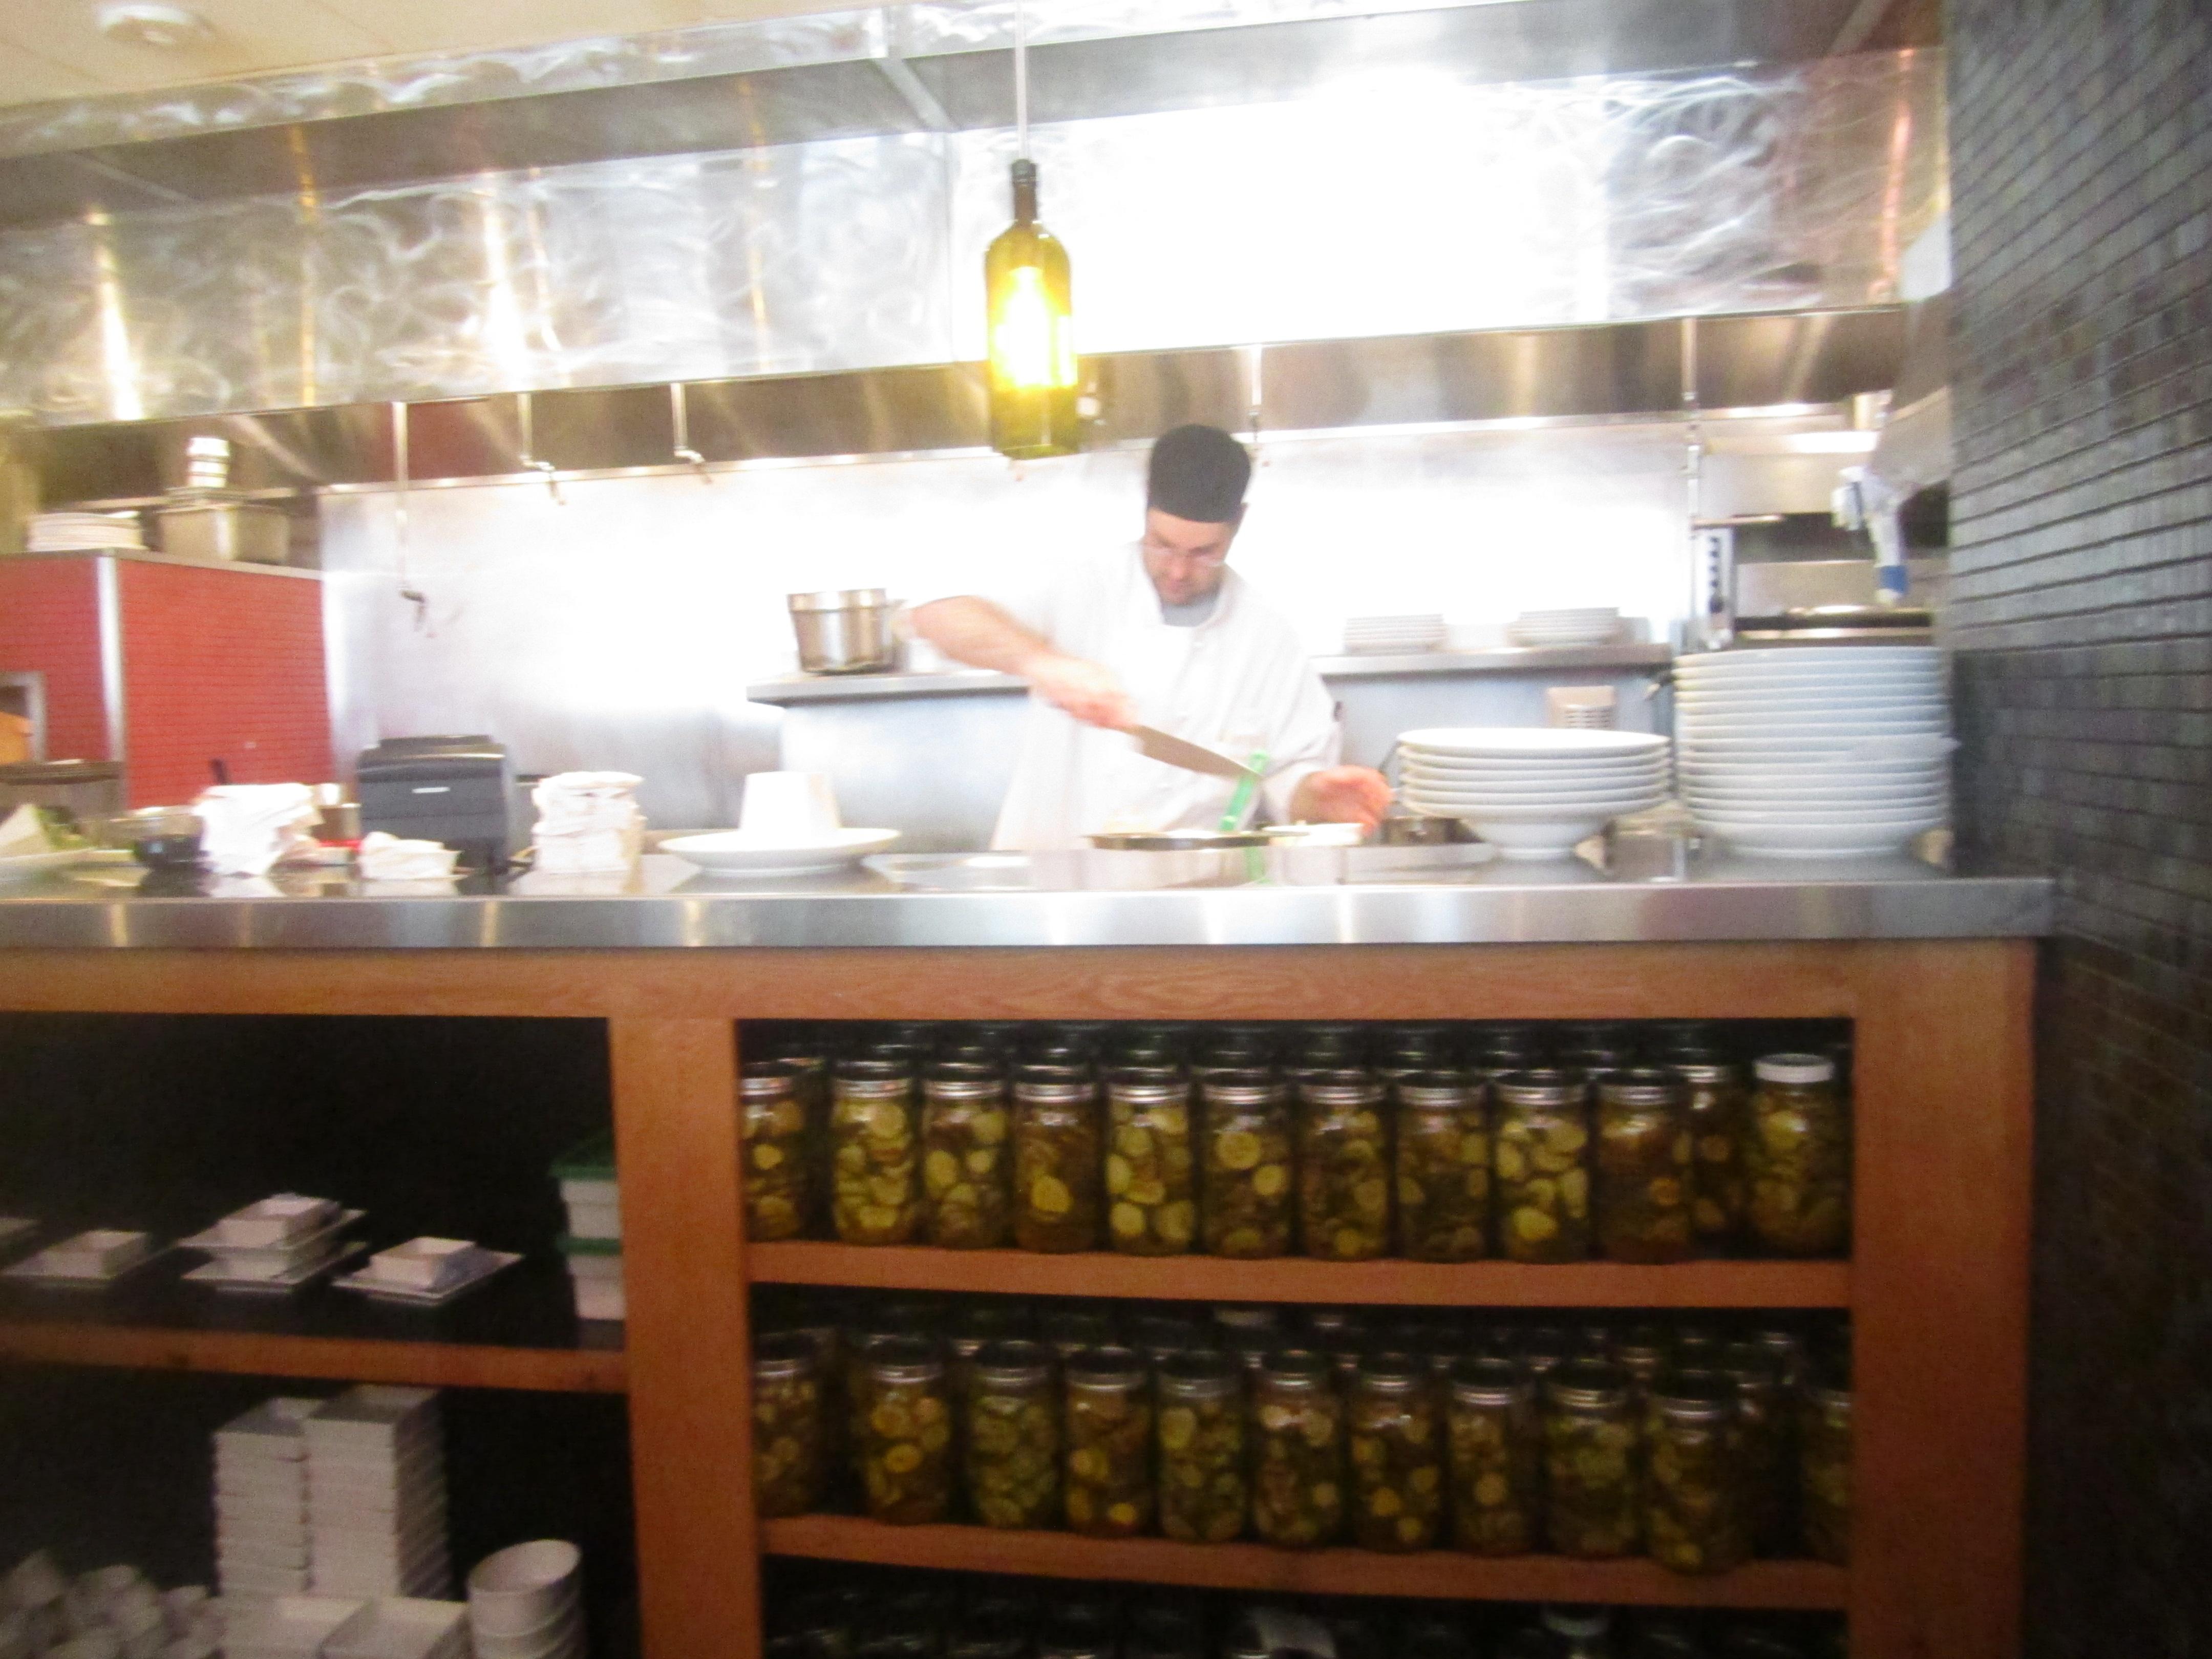 EVOO Restaurant, Kendall Square, Cambridge – BakingMeHungry